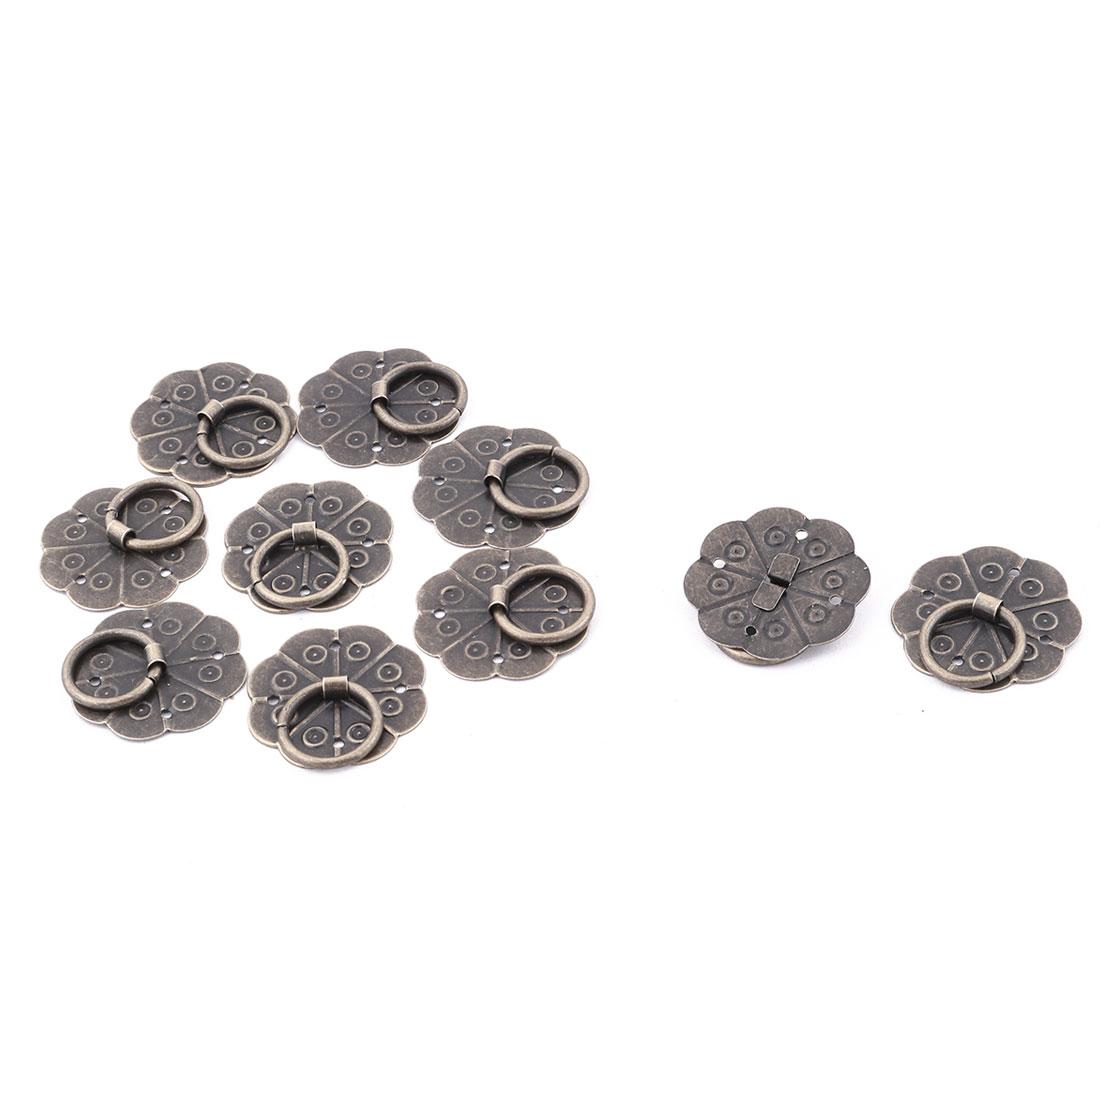 29mm Dia Cabinet Drawer Metal Round Ring Pull Handle Hardware Bronze Tone 10pcs